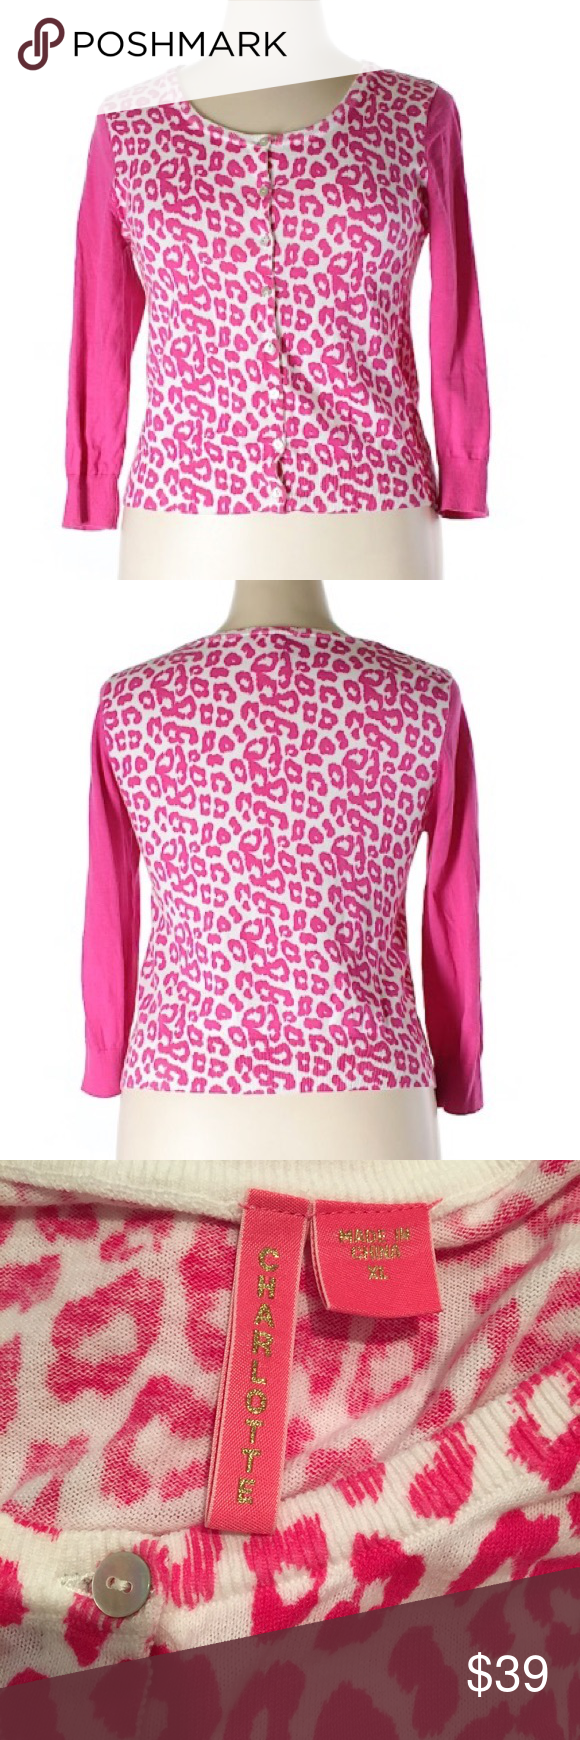 Charlotte Tarantola Pink Leopard Cardigan Size XL | Pink ...